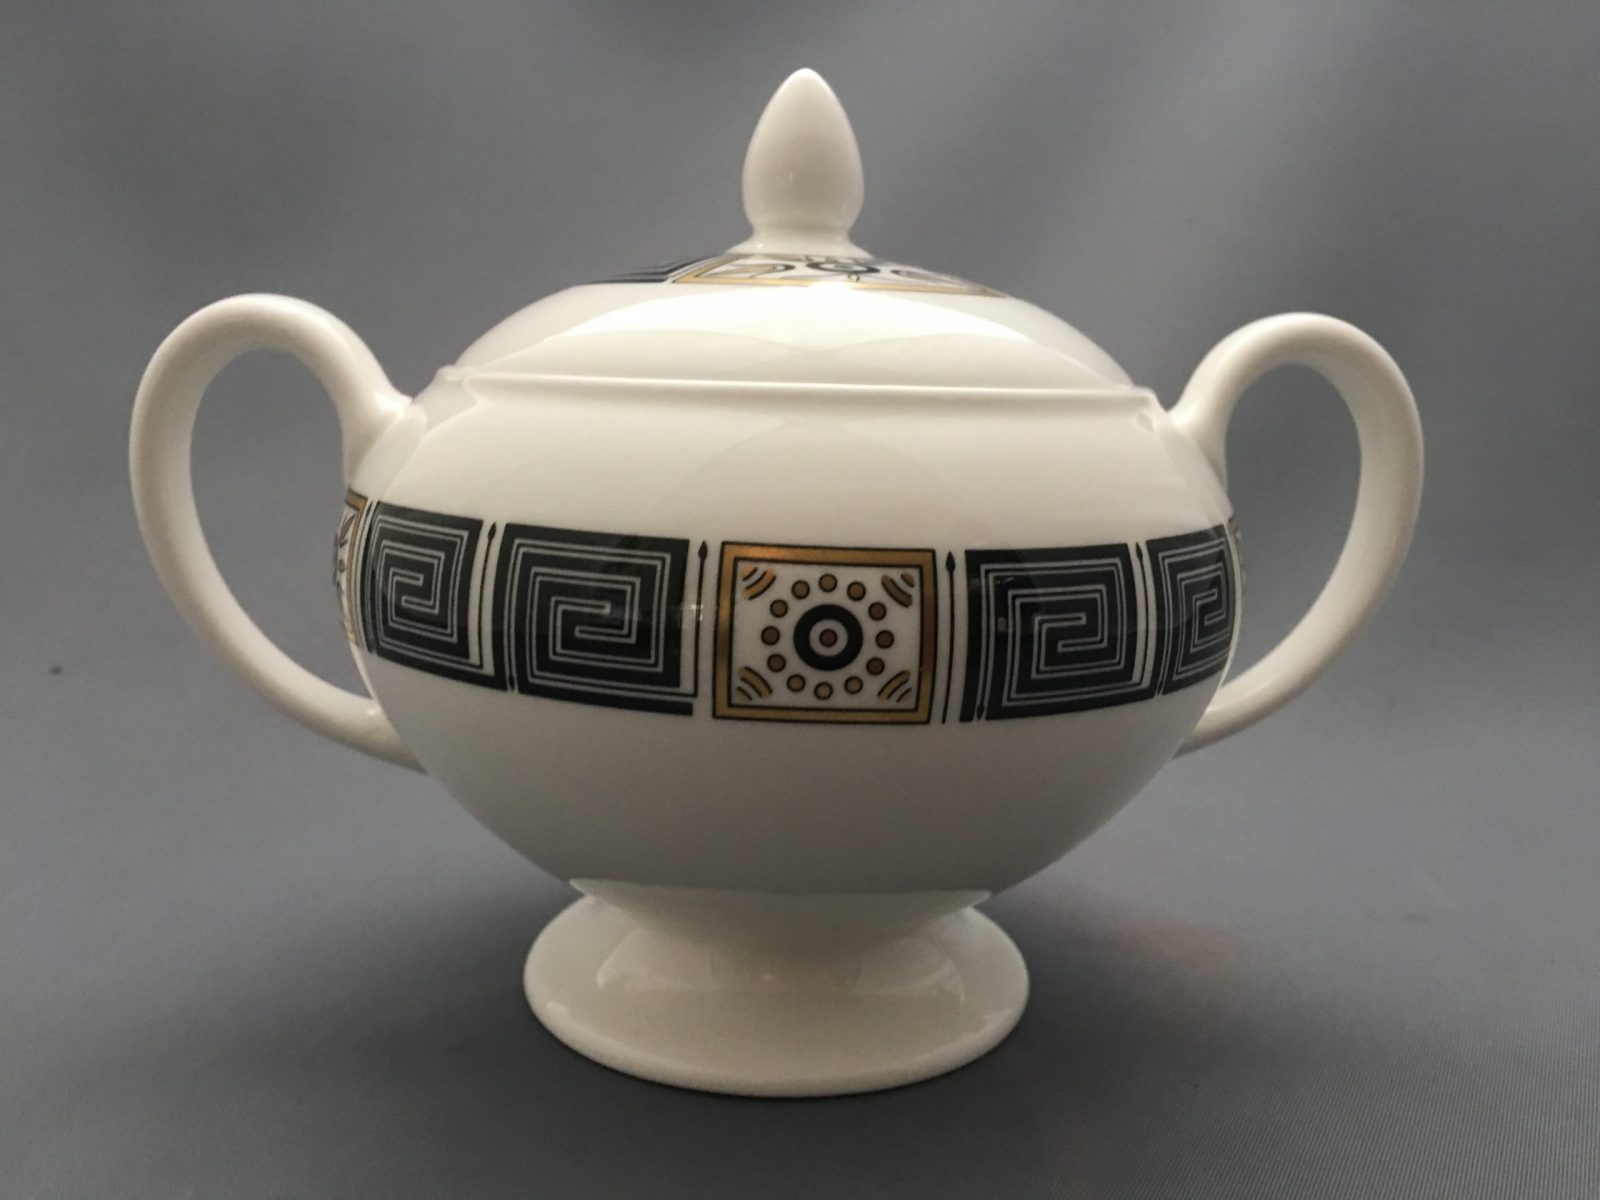 Wedgwood Asia Black Bone China Lidded Sugar Bowl Tea Replace Your Plates